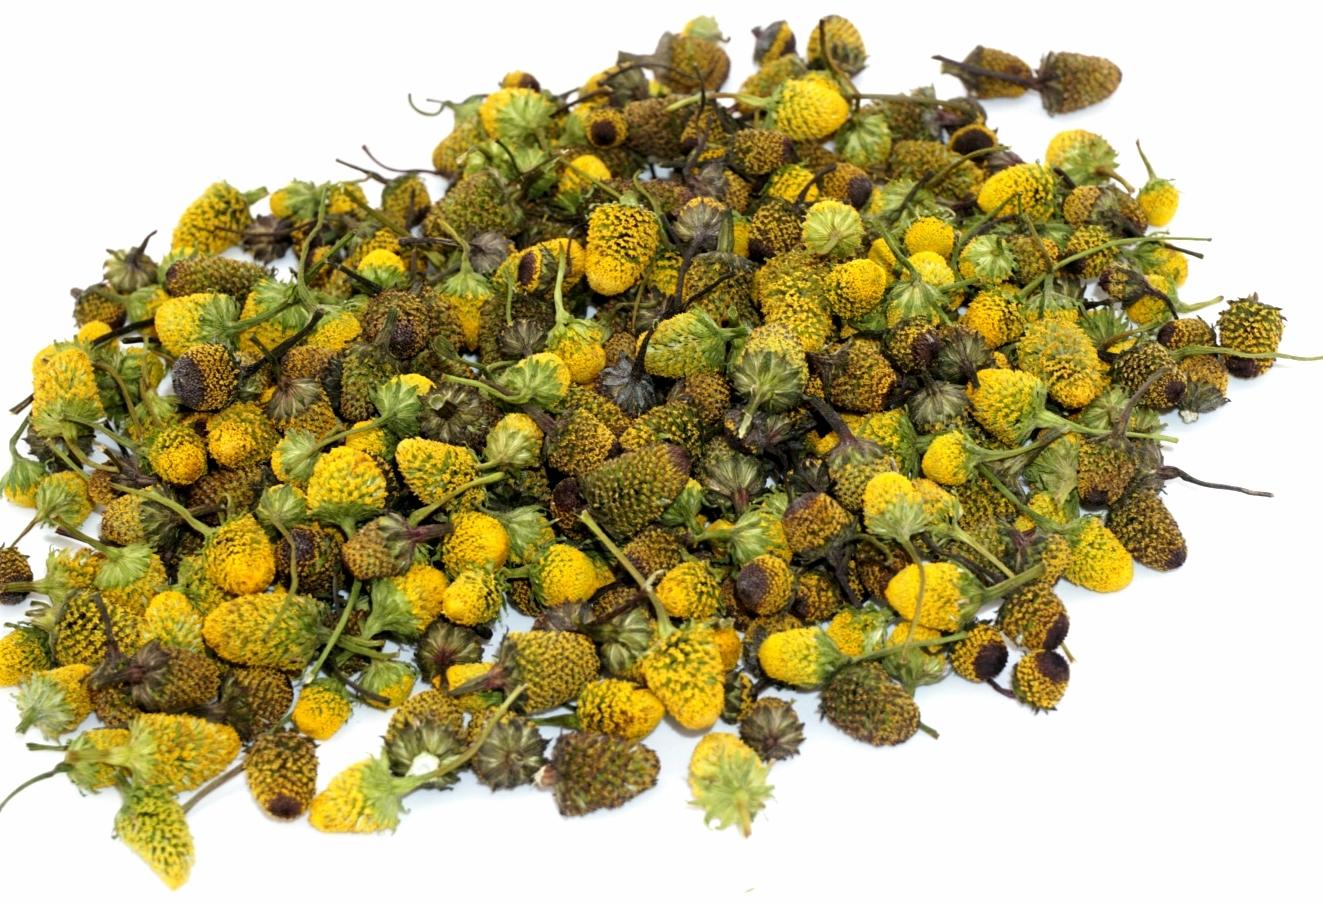 Dried Buzz Button Flowers. ~150-200 flowers. 00024